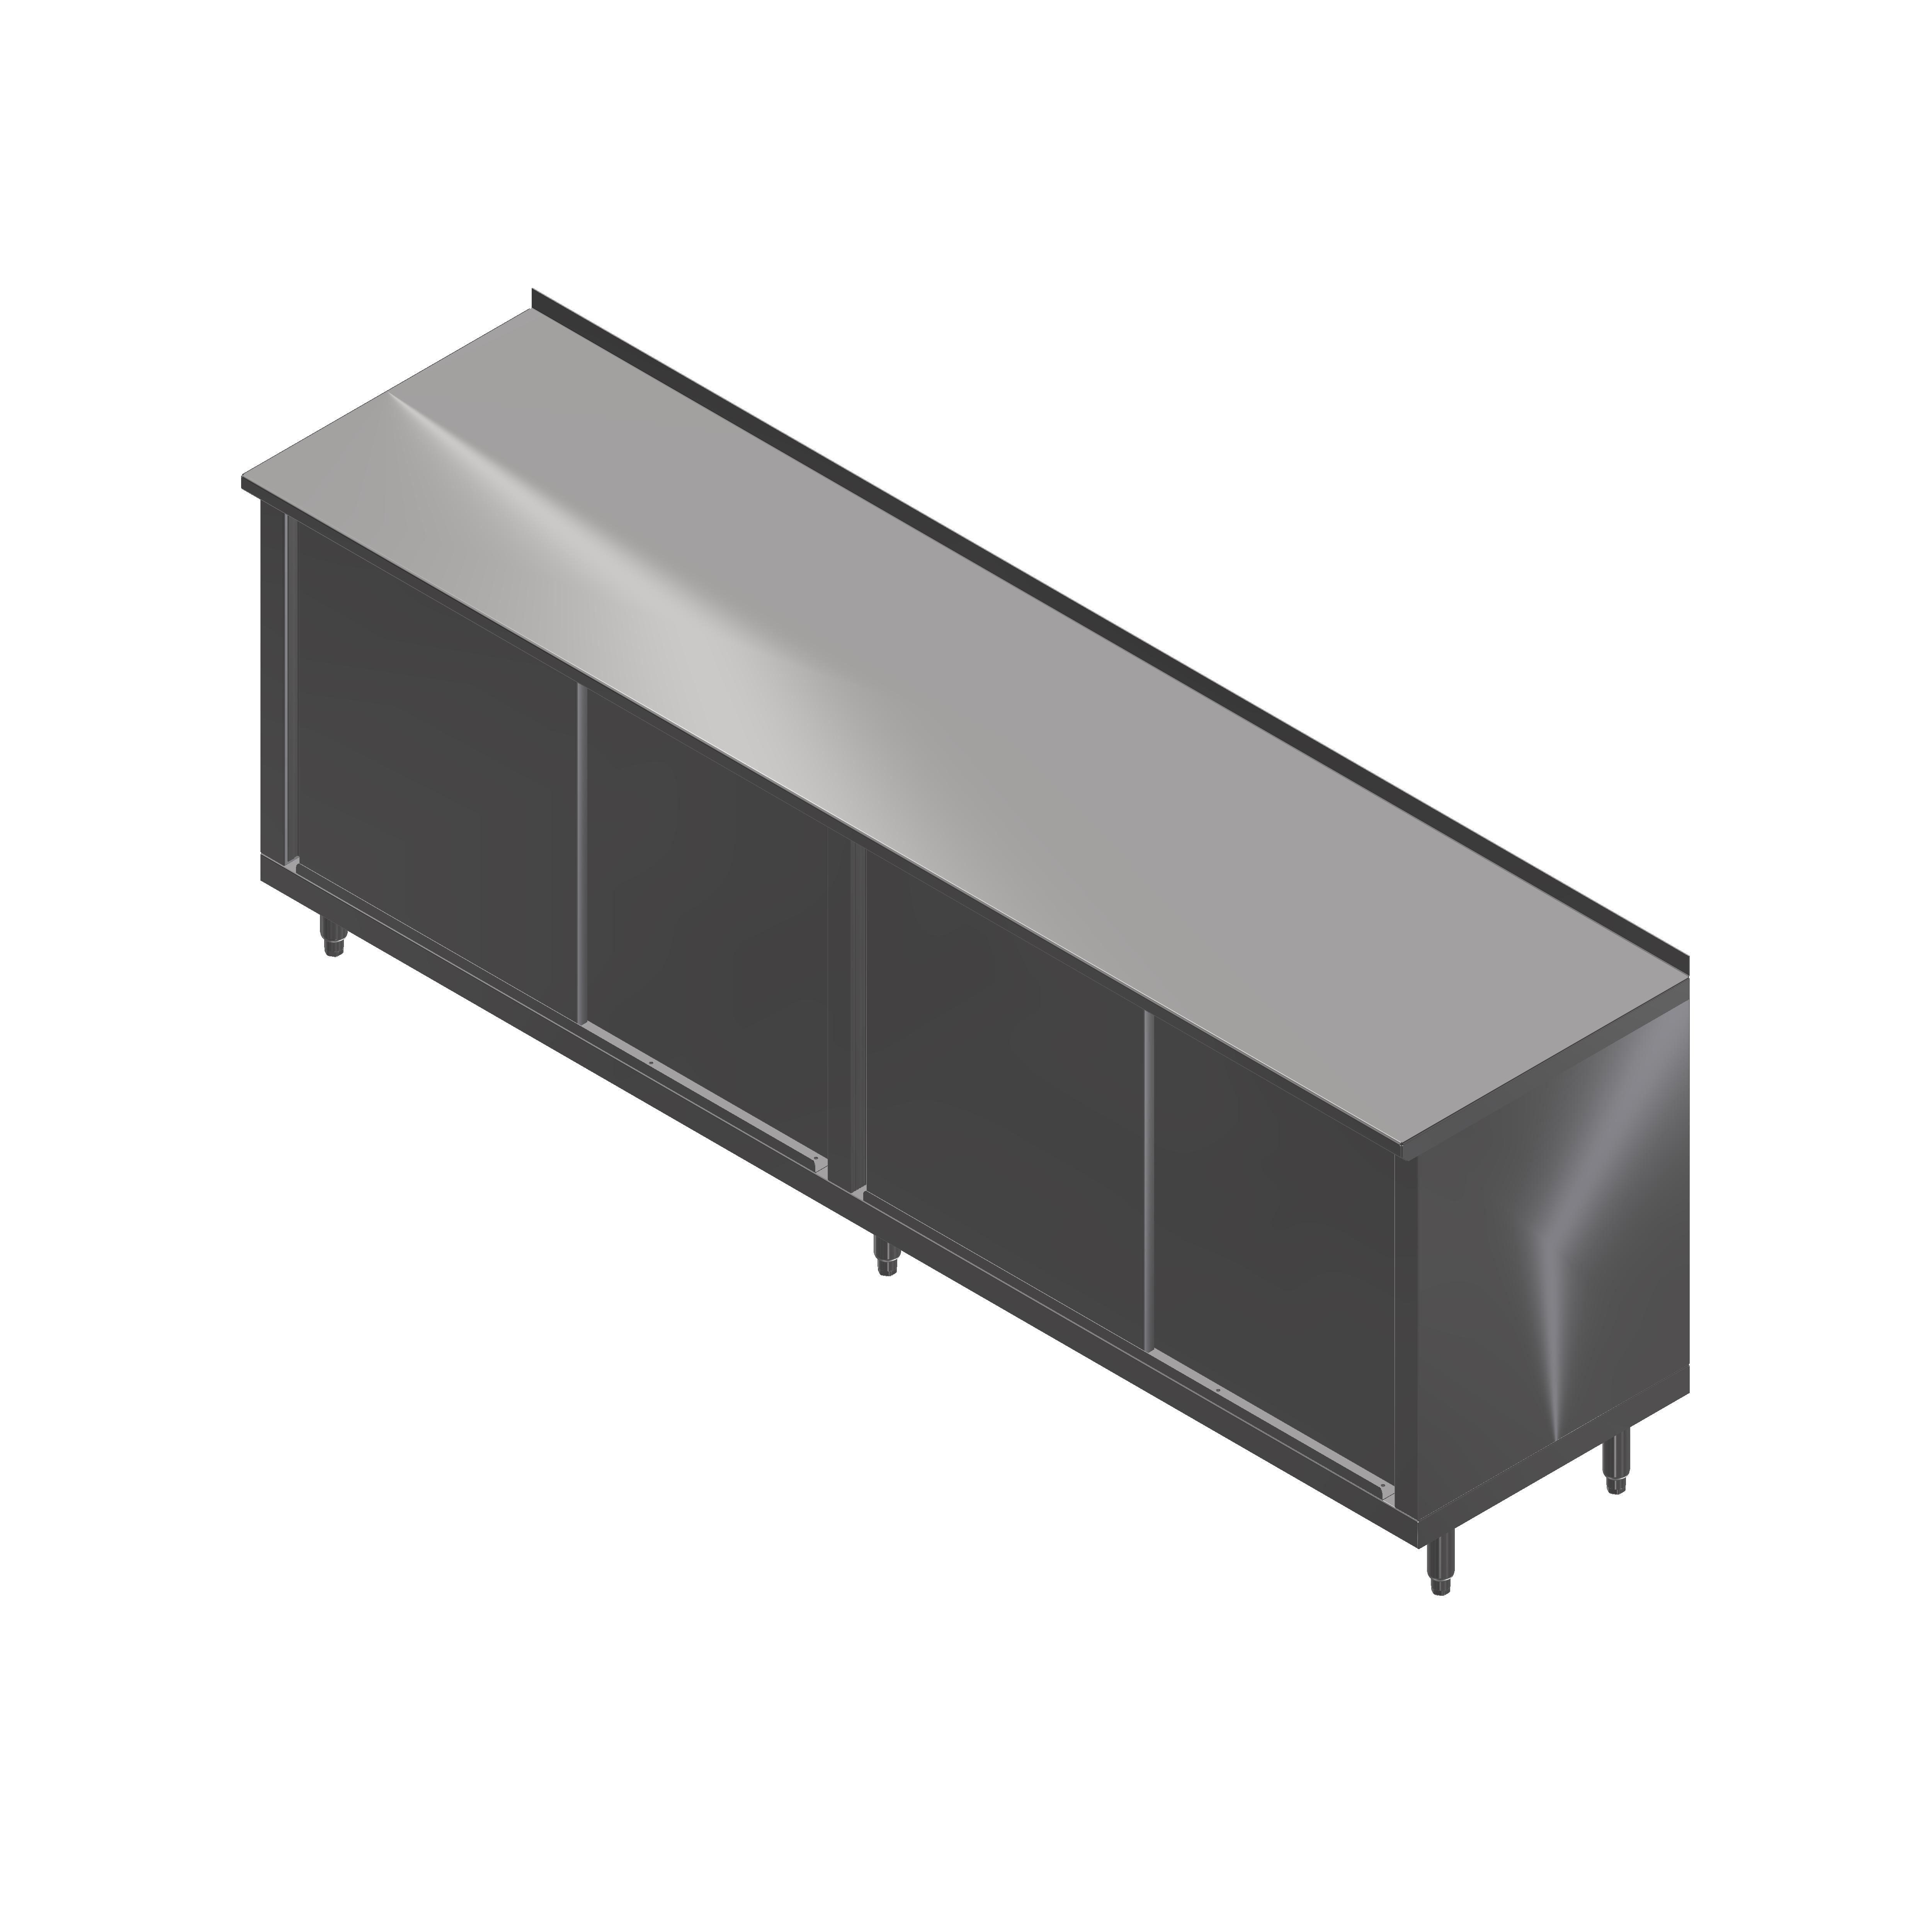 John Boos 4CS4R1.5-36120 work table, cabinet base sliding doors